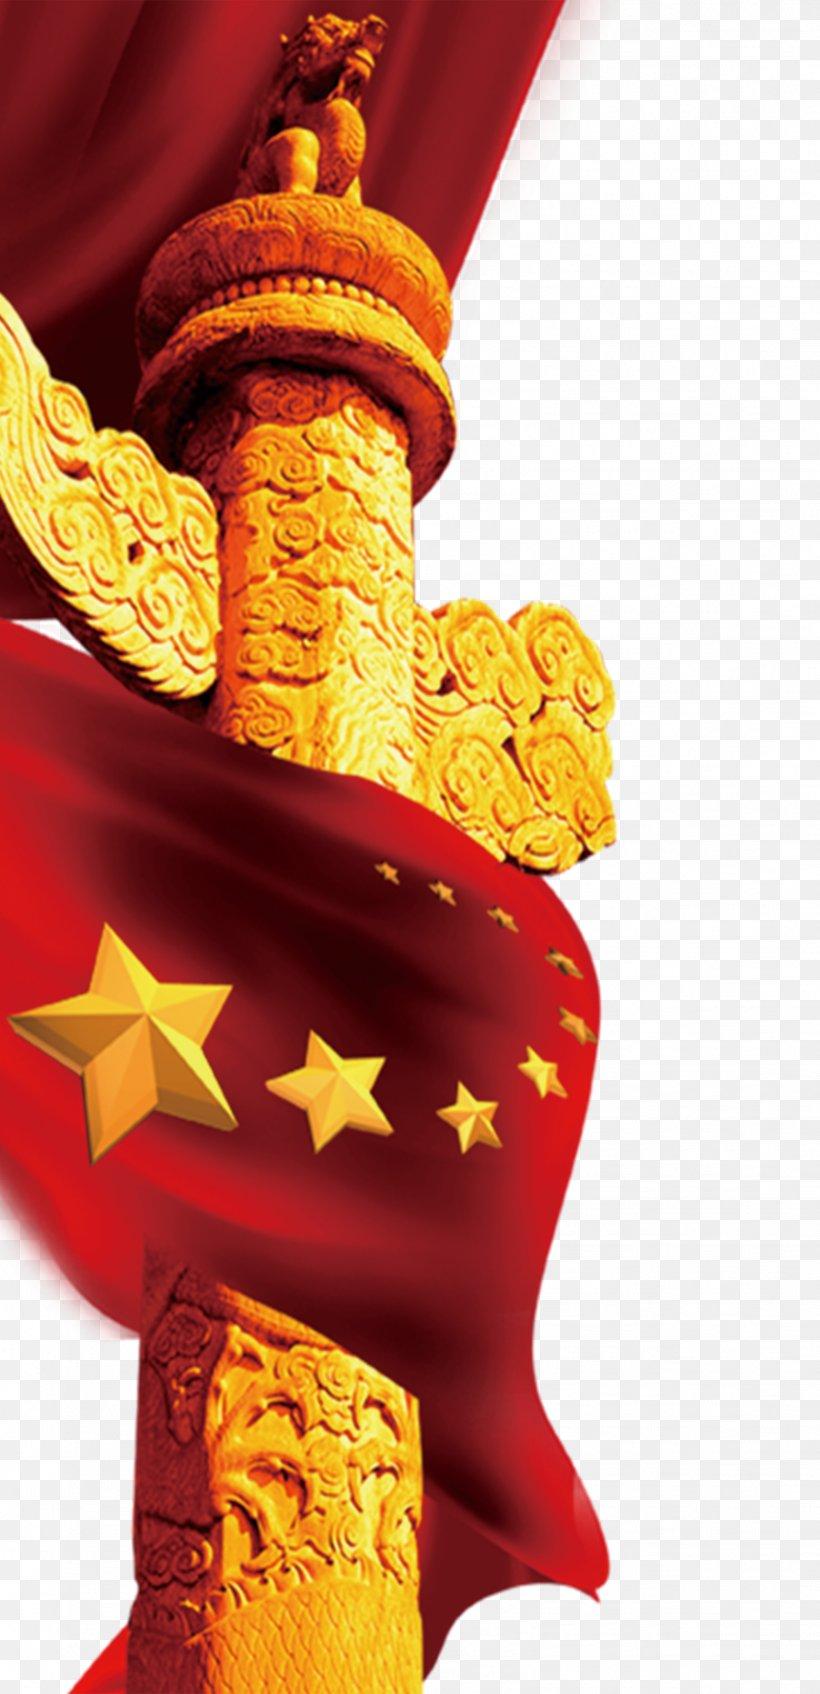 Tiananmen Zhonghua Huabiao National Day Of The Peoples Republic Of China, PNG, 1569x3243px, Tiananmen, Art, China, Column, Gold Download Free